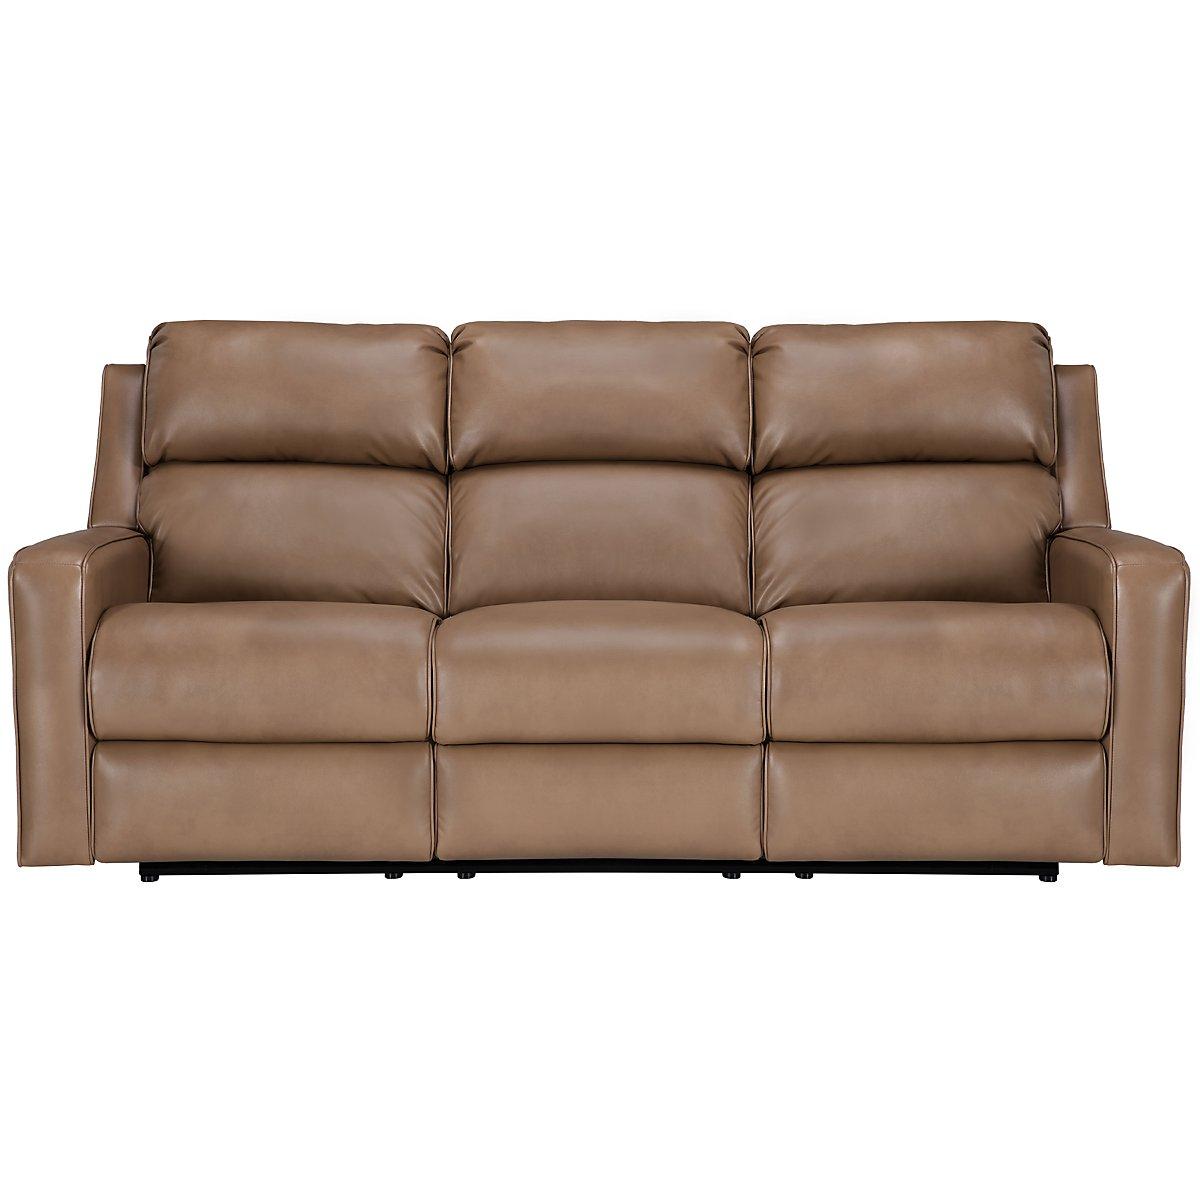 Rocco Dark Taupe Microfiber Power Reclining Sofa